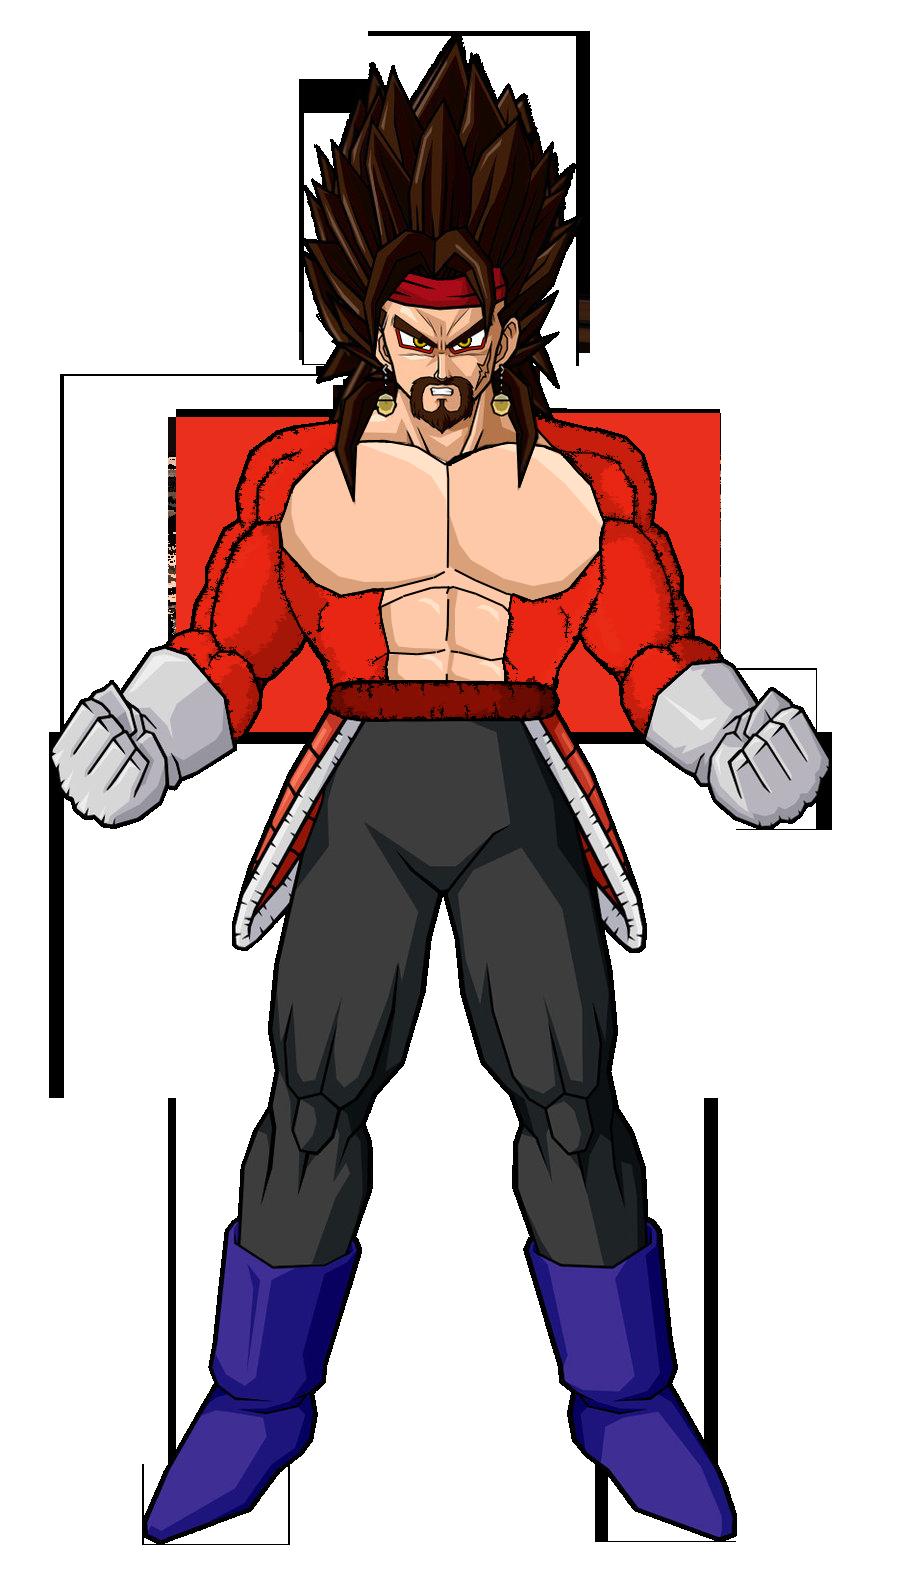 fusion goku ultra dragon ball wiki fandom powered by wikia - HD900×1580